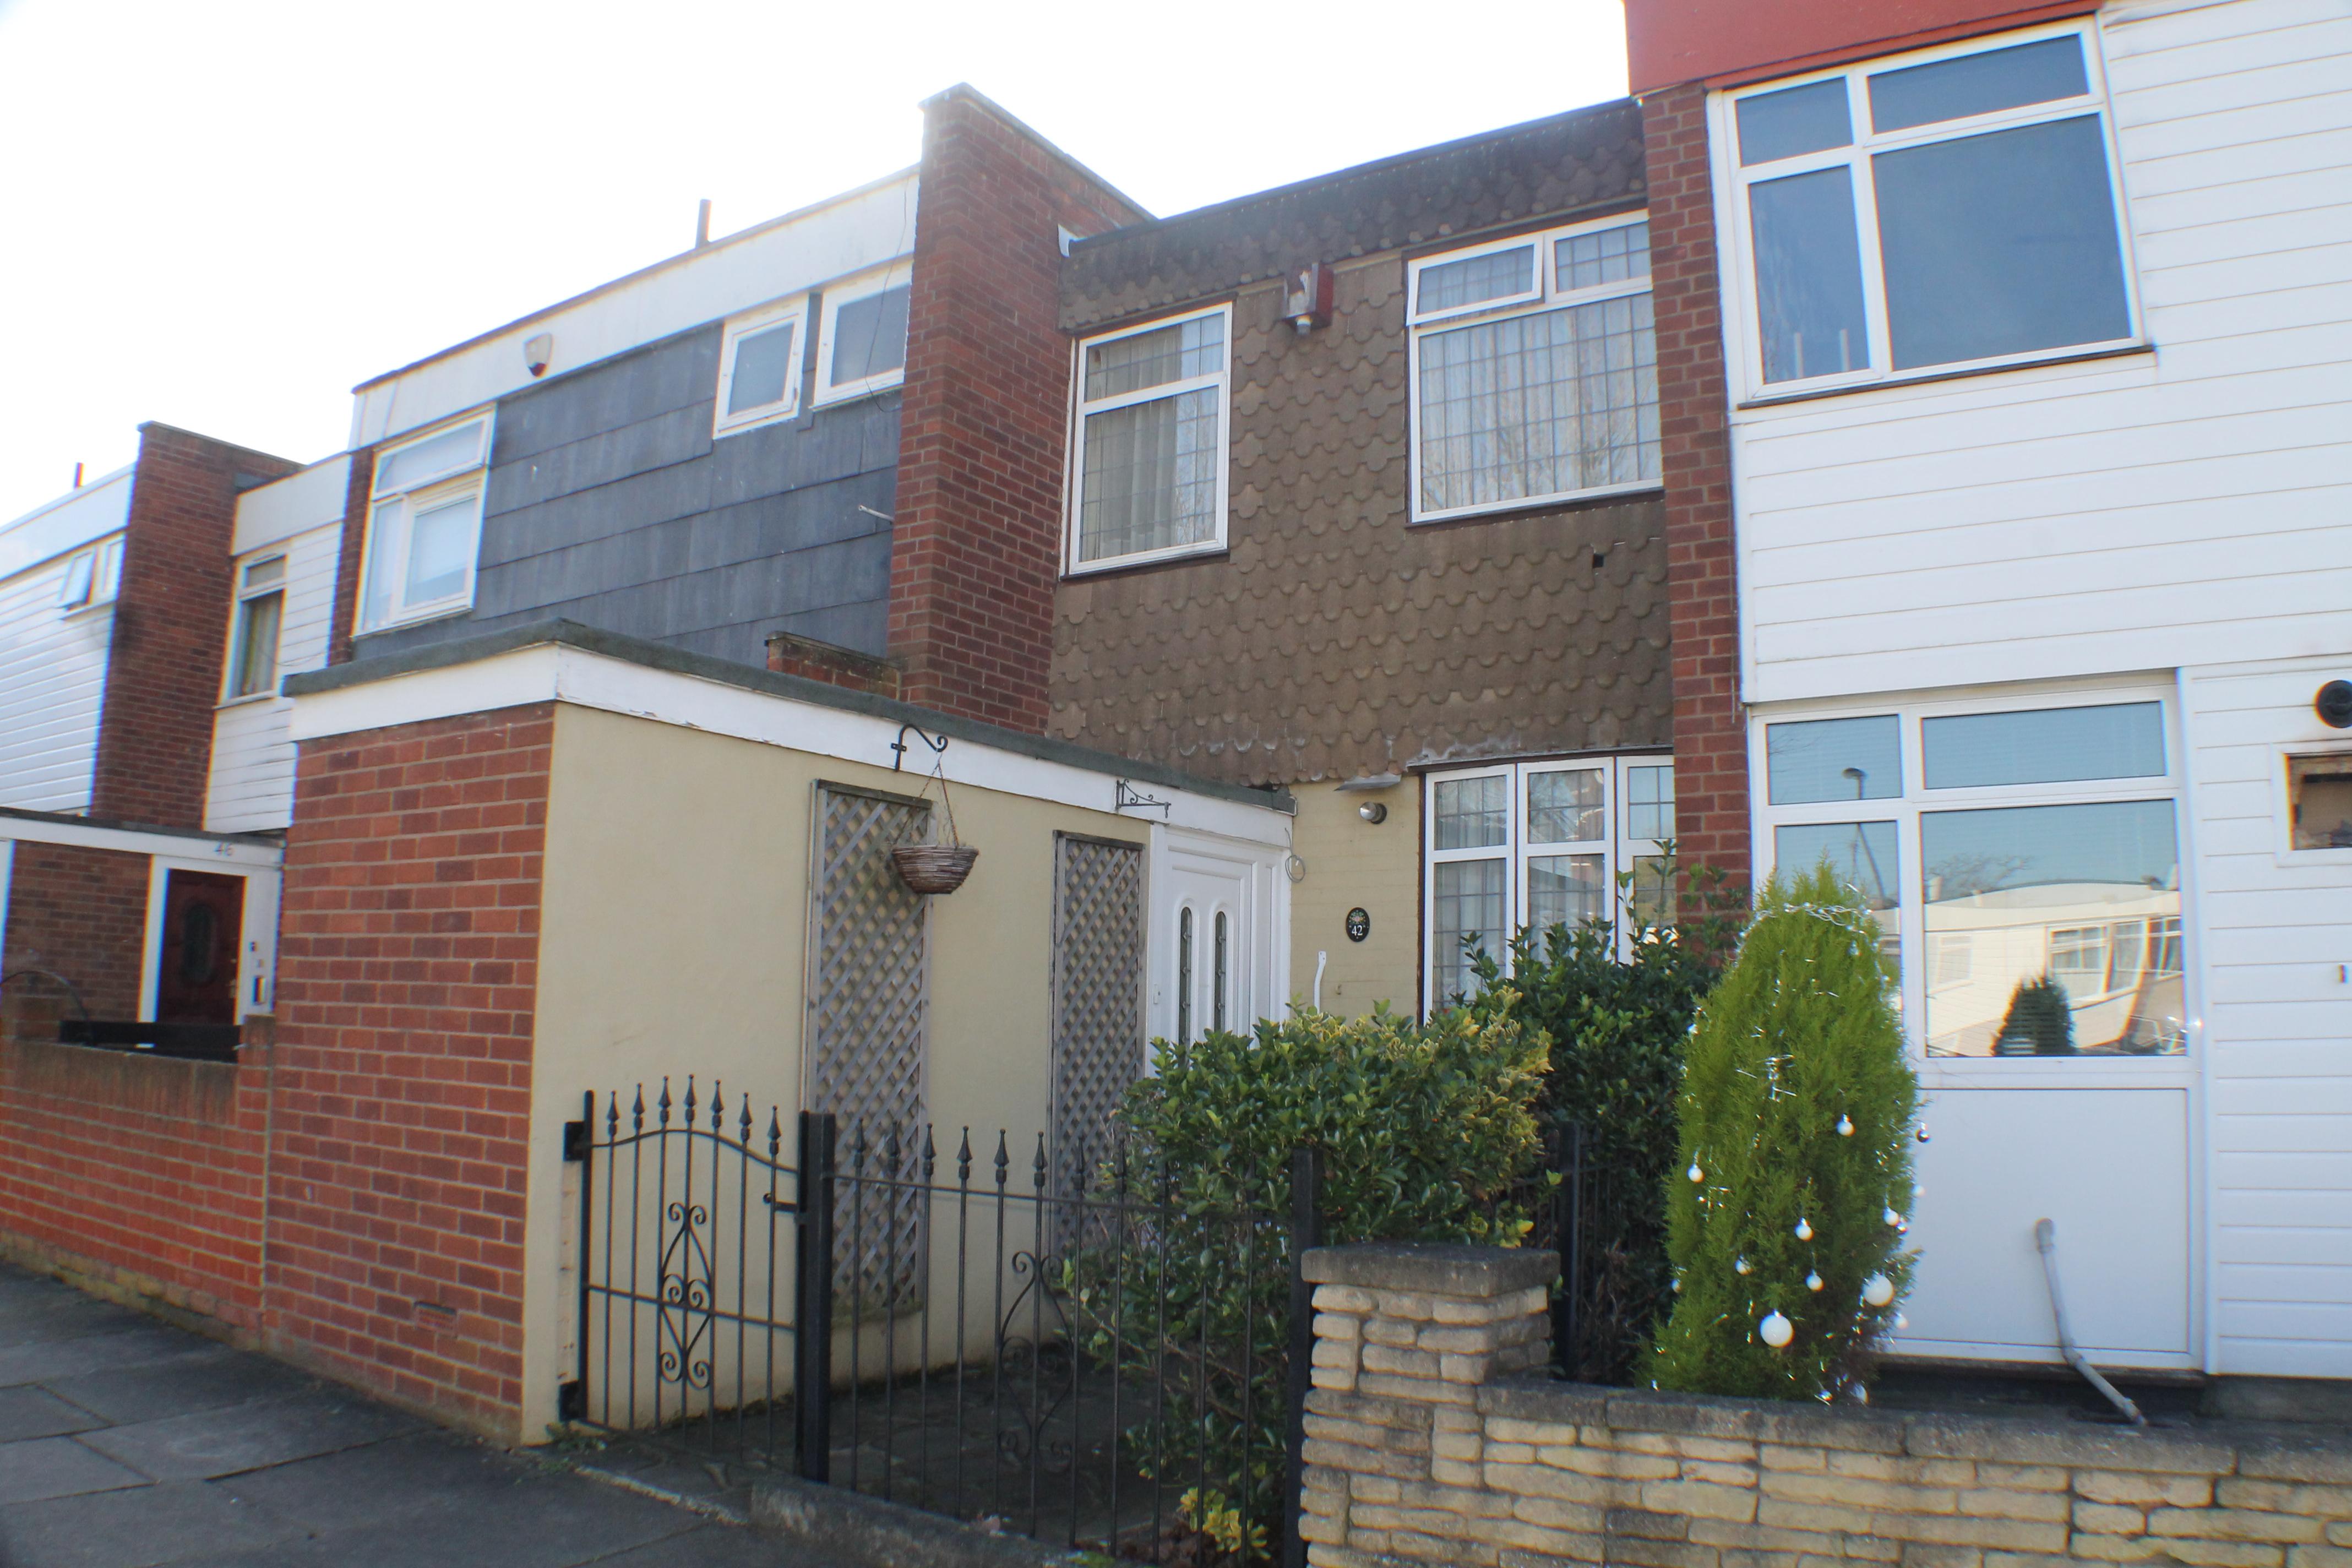 Lambscroft Avenue, Mottingham